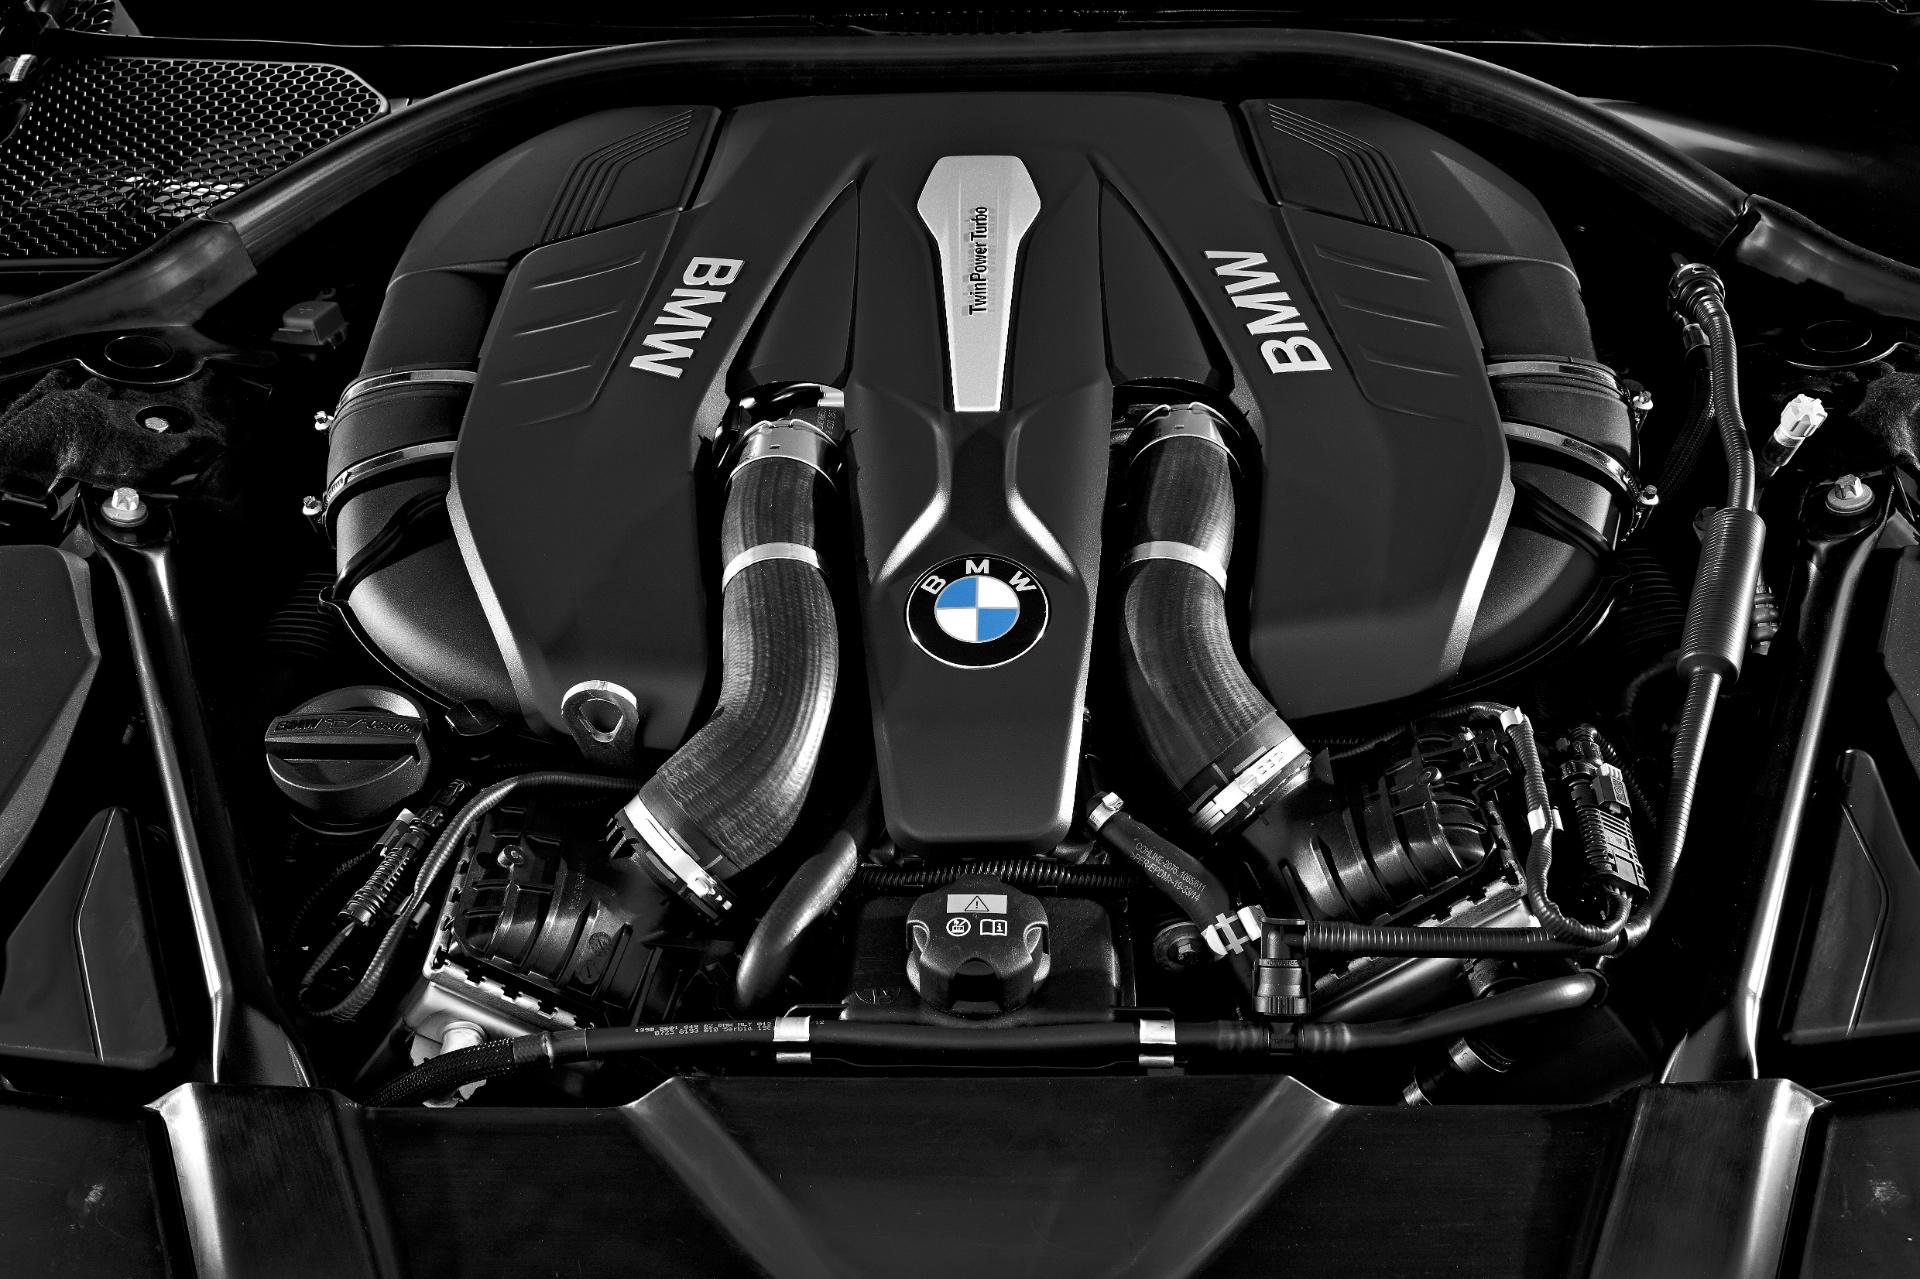 2016-bmw-7-series-engine-line-up-revealed-in-full-96540_1.jpg